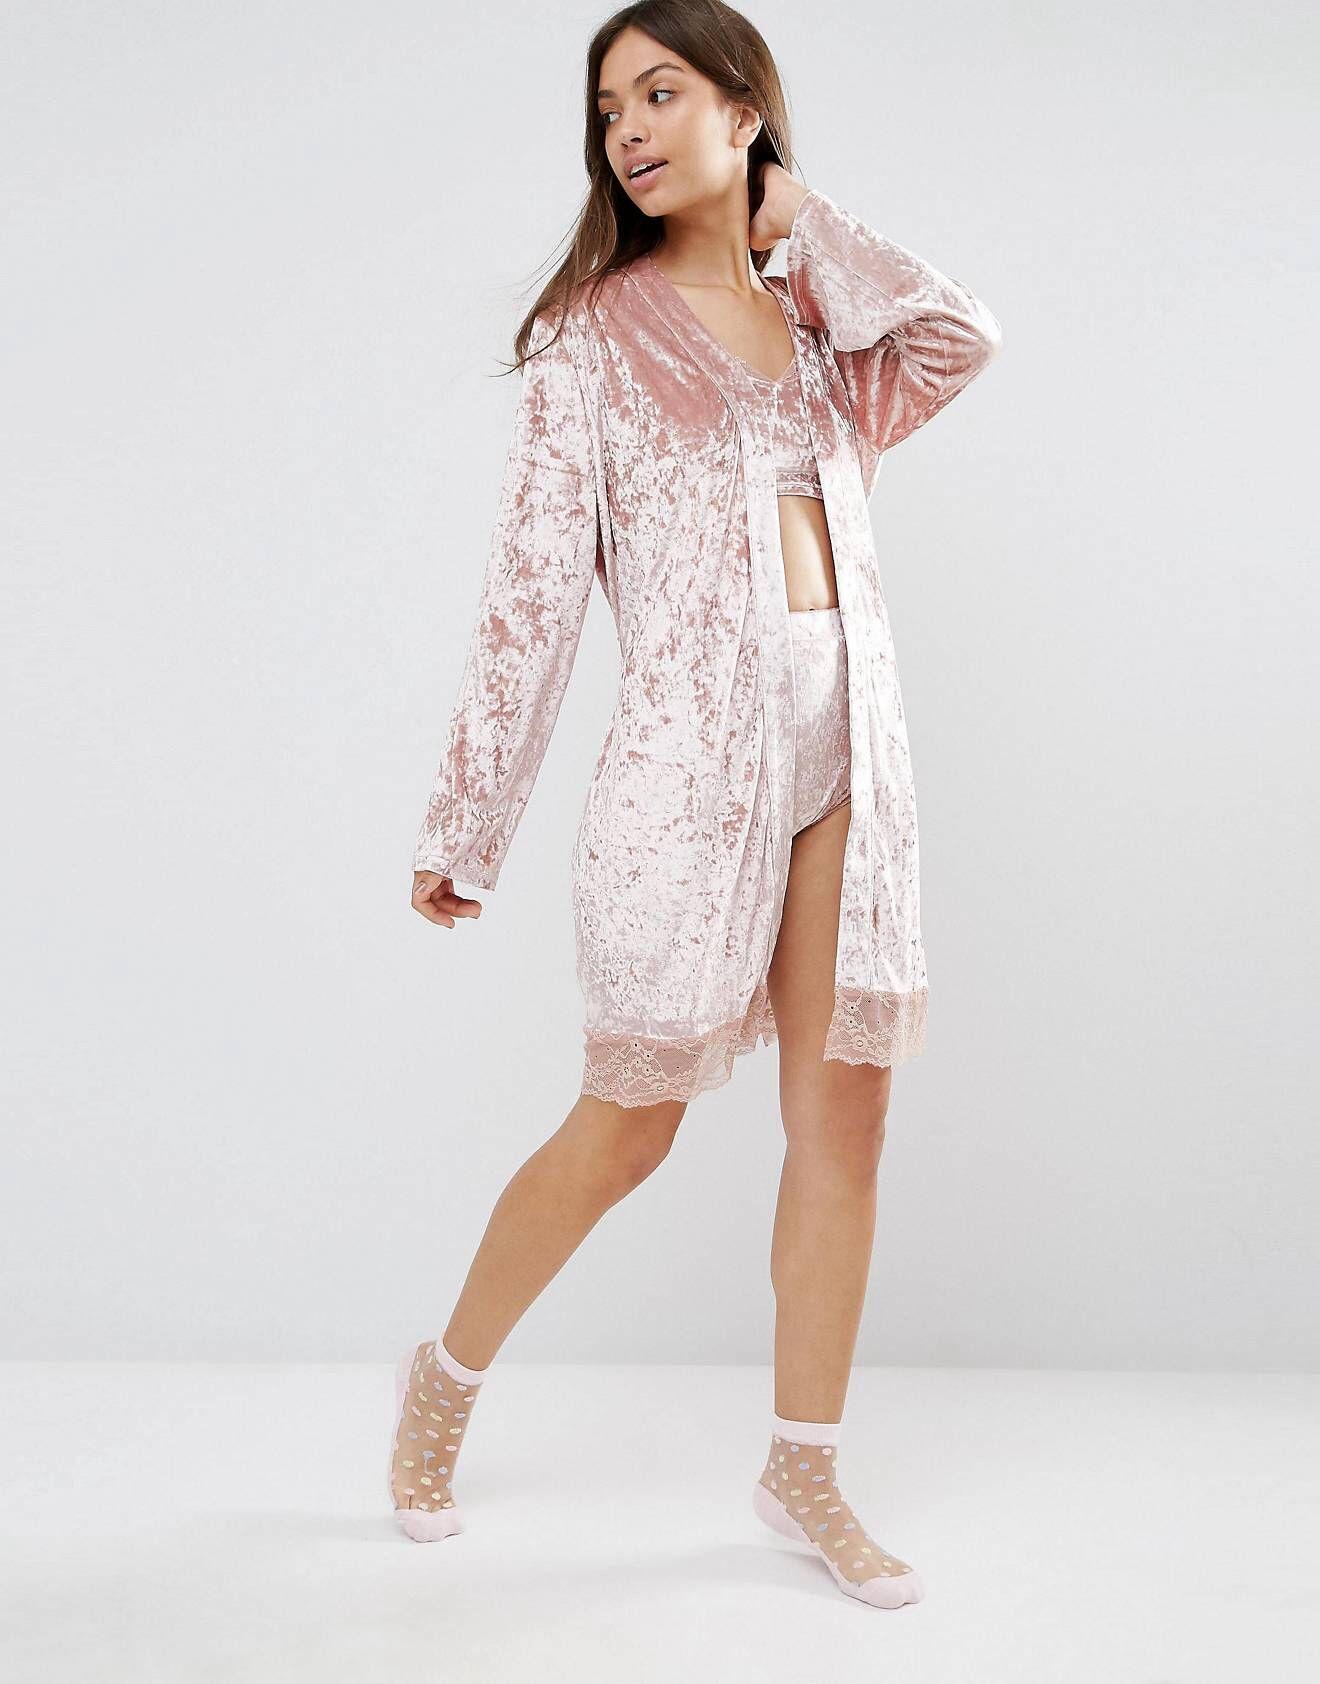 The Costume Lounge: Spotlight on Style Pro Raquel Garcia